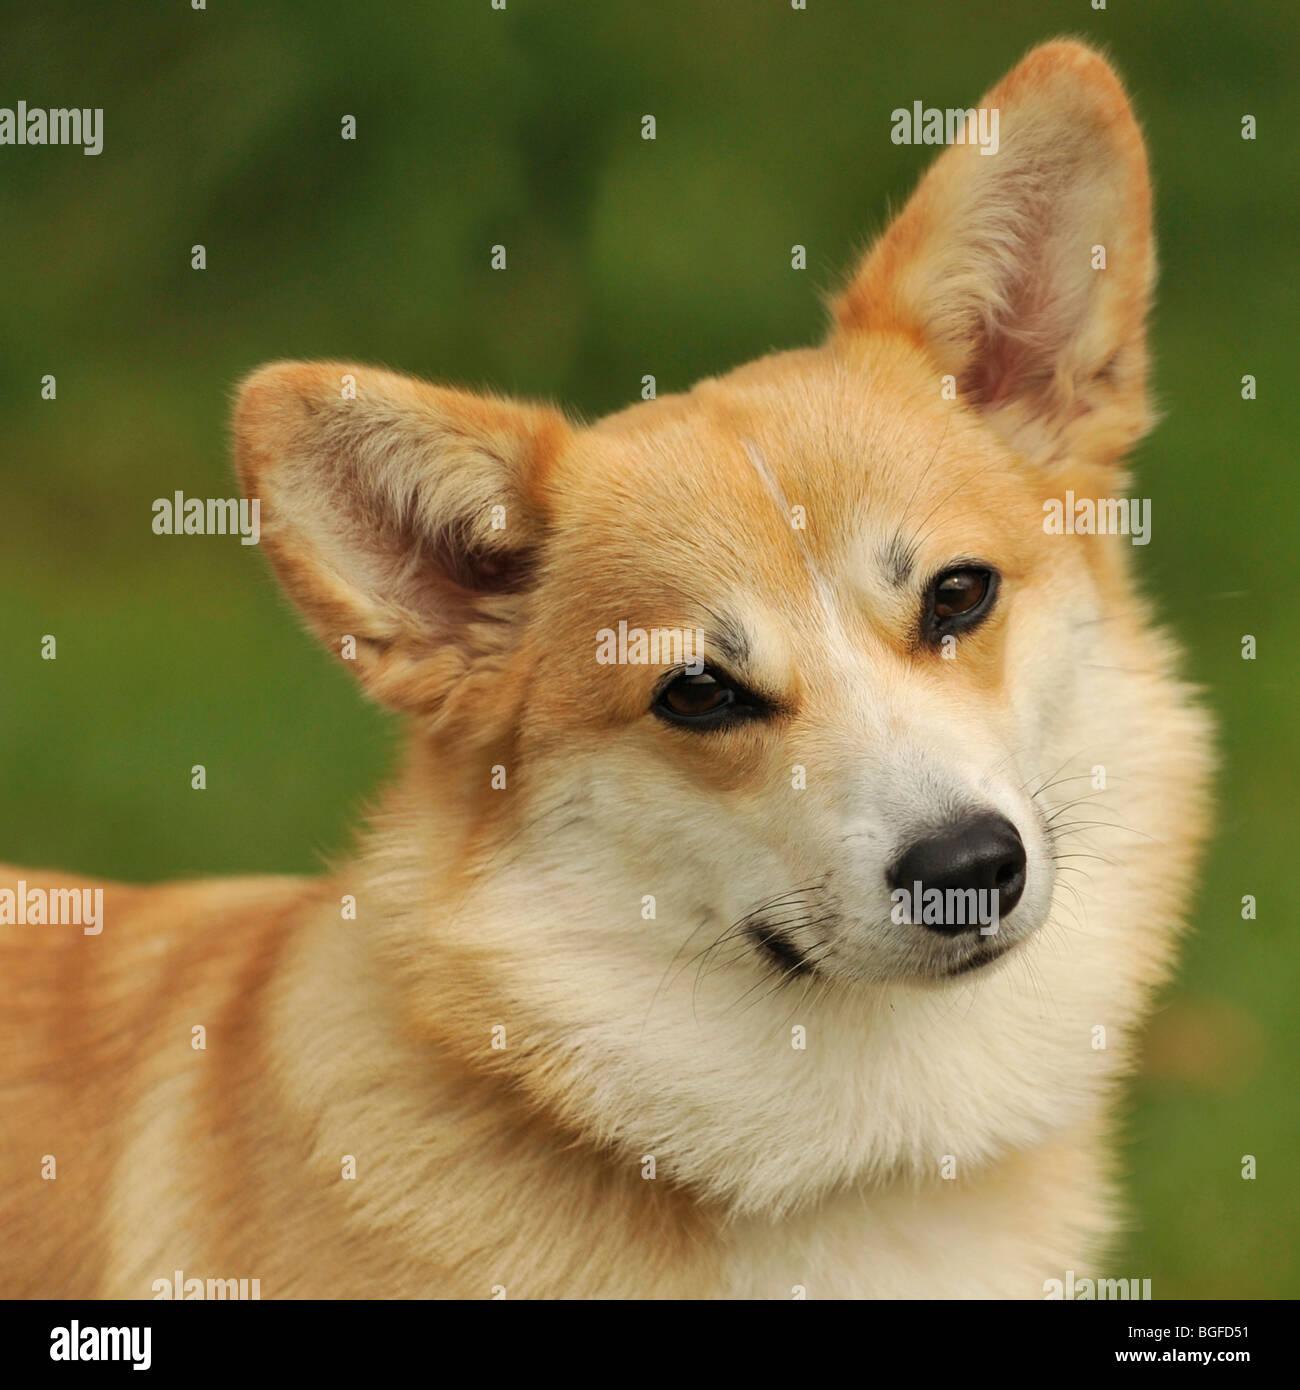 pembroke corgi head study - Stock Image